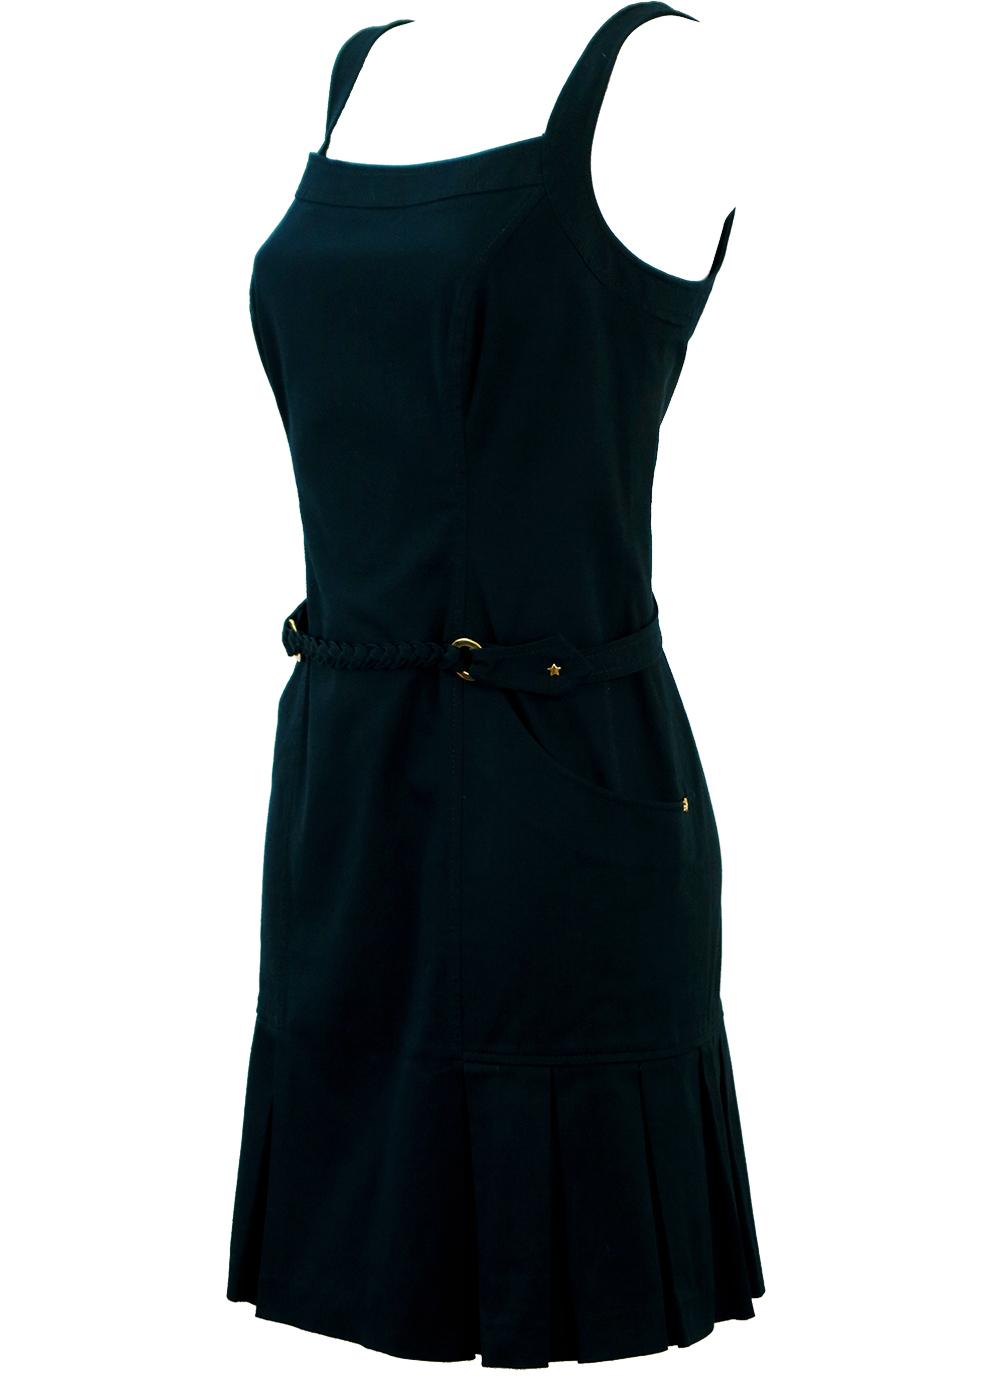 adbecfb373 Luisa Spagnoli Navy Blue Nautical Style Above the Knee Dress – M/L ...